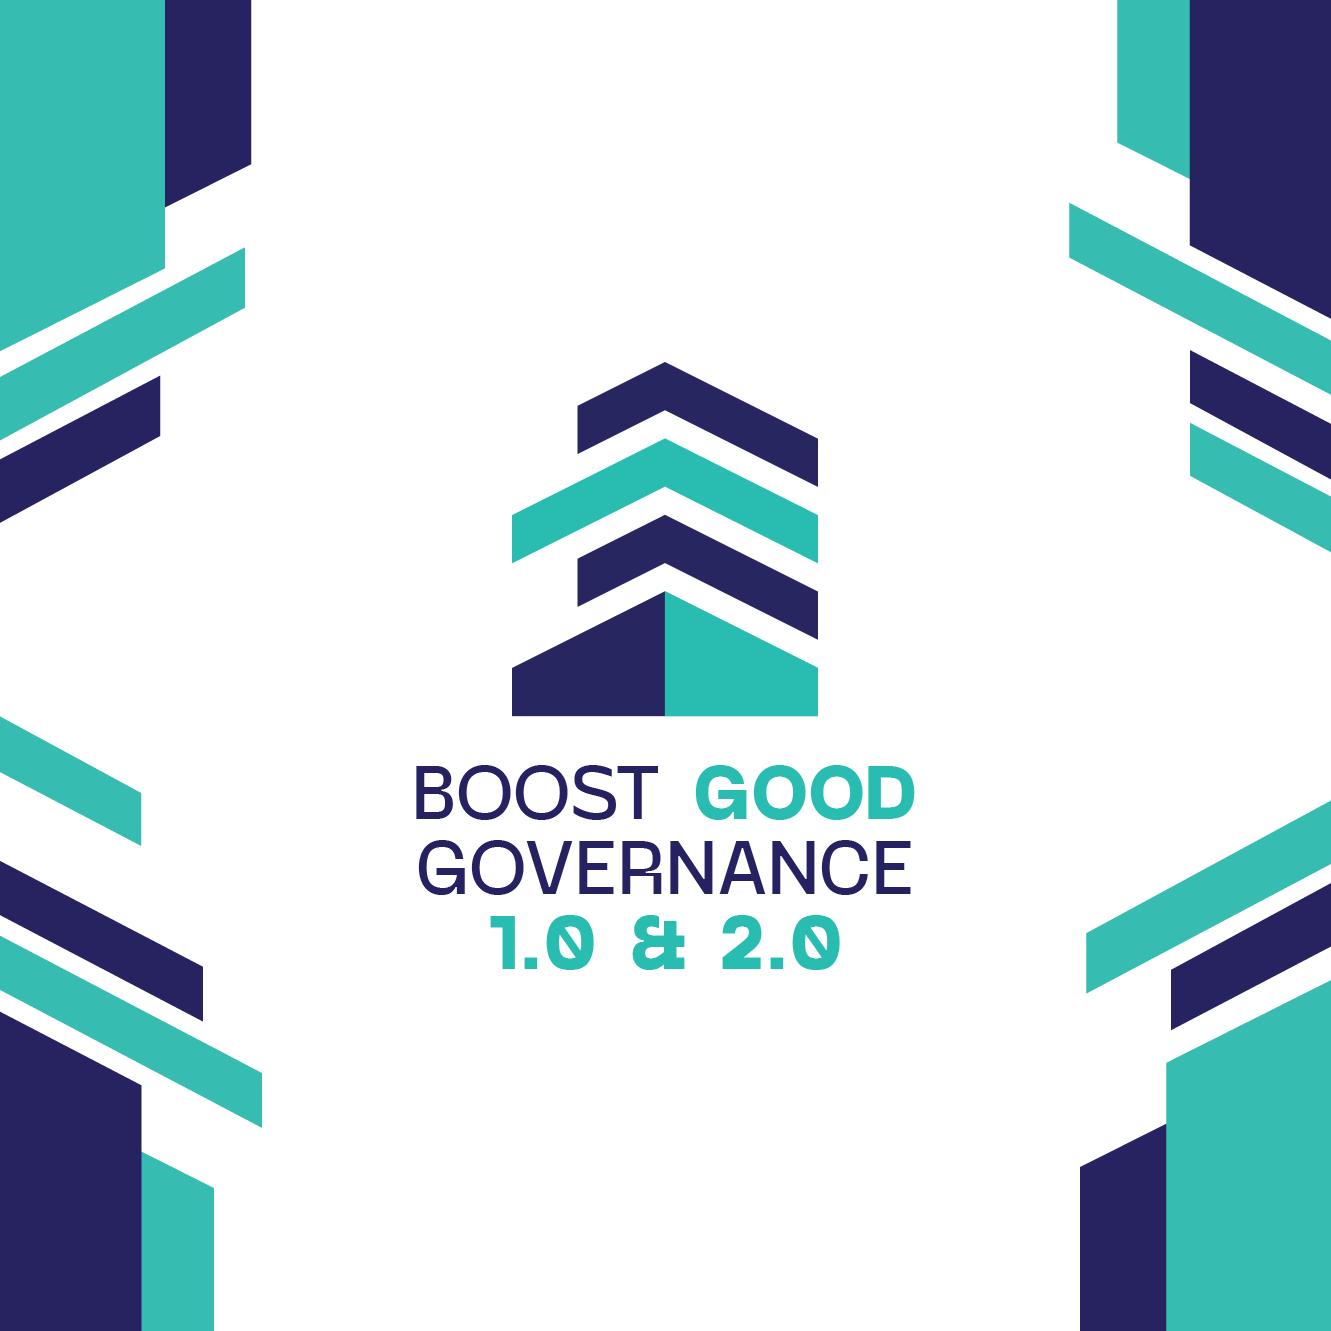 Boost Good Governance 1.0 & 2.0